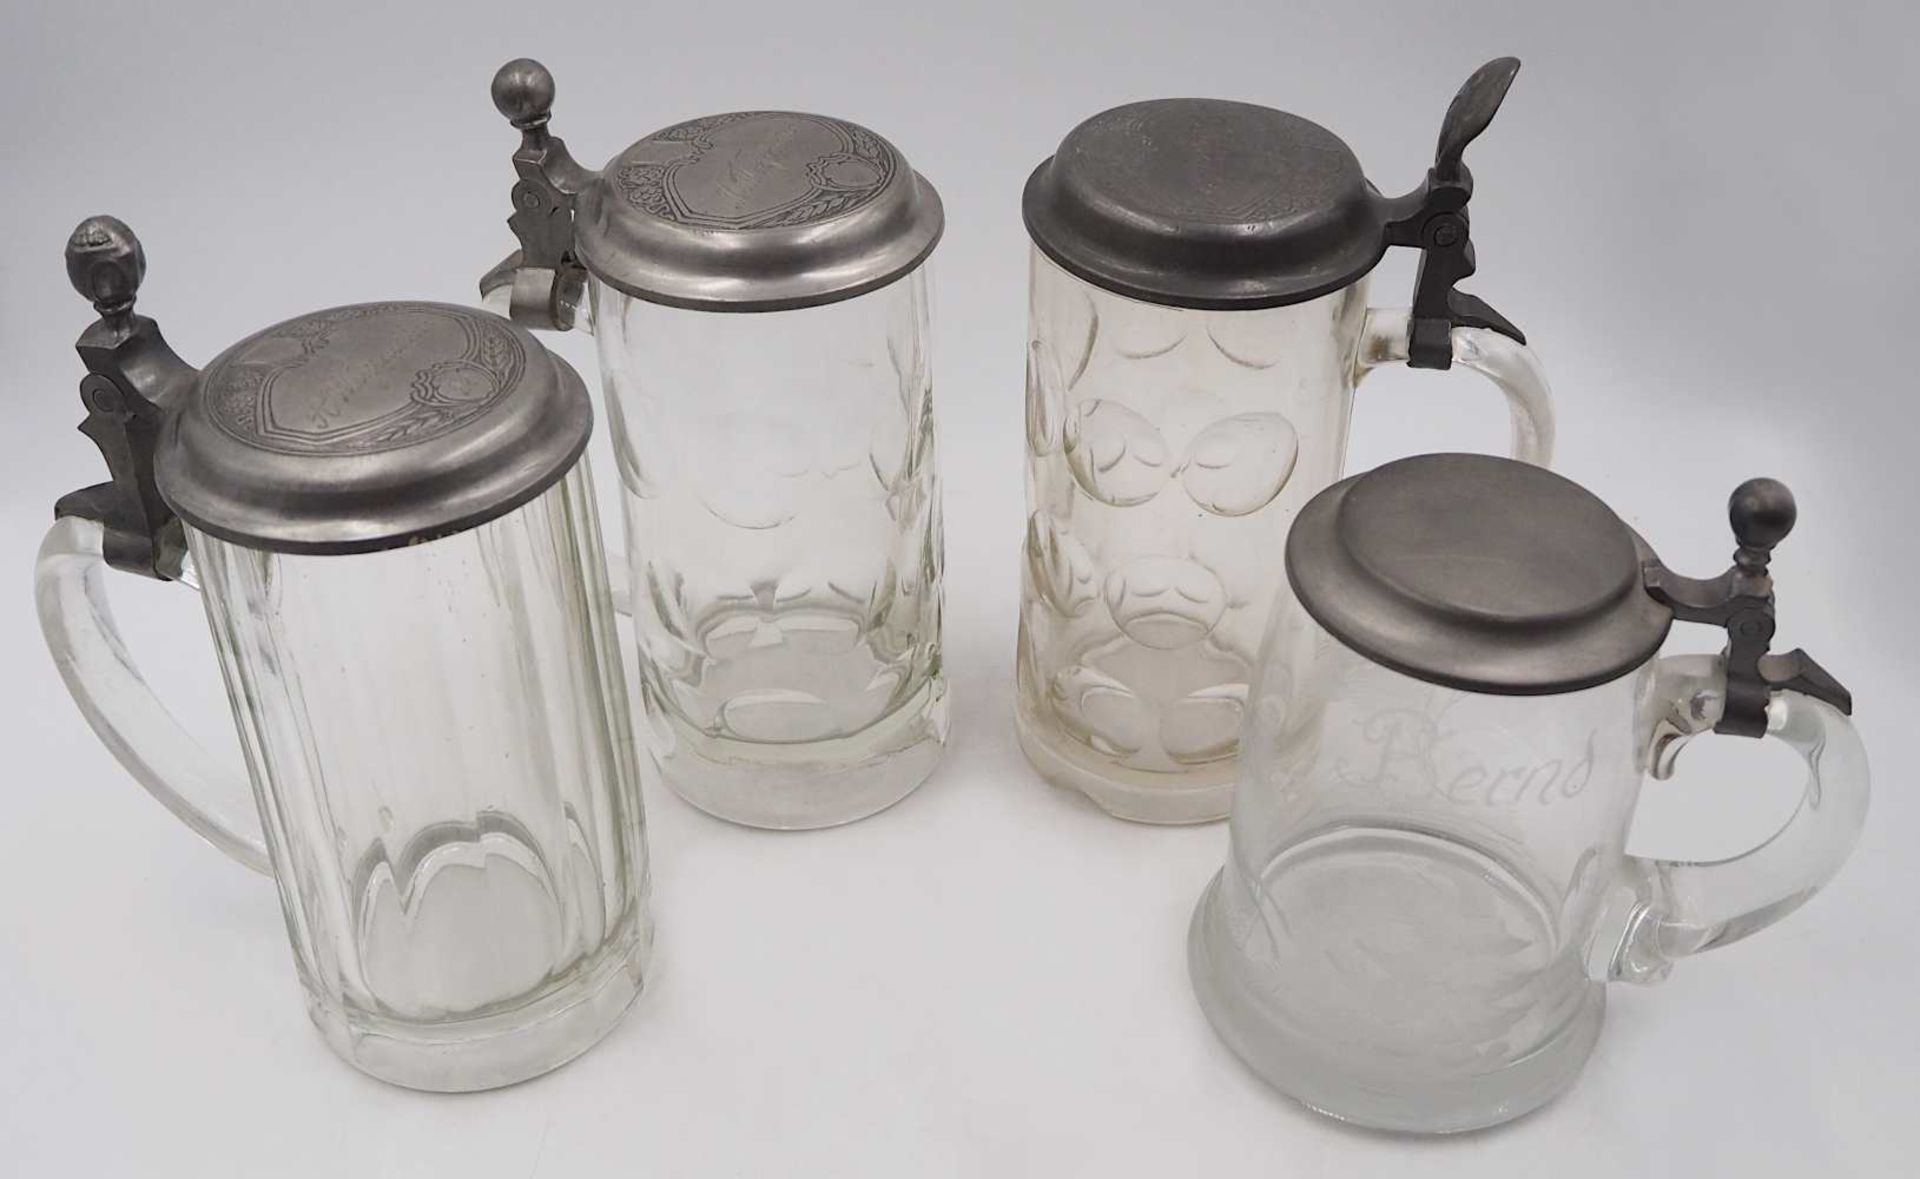 1 Konv. Bierkrüge z.T. 1. Hälfte 20. Jh. Glas/Keramik/Zinn, je mit Zinndeckel, z.T. - Bild 2 aus 2